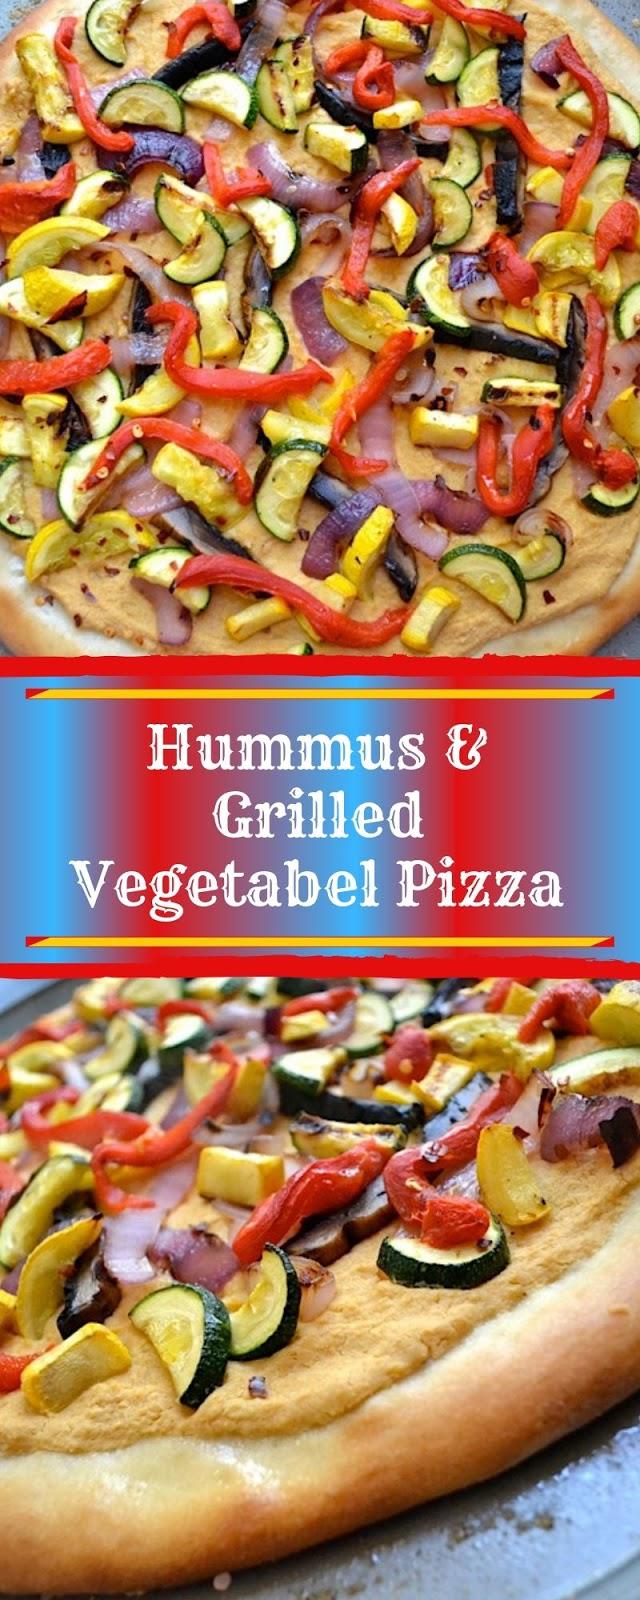 Hummus & Grilled Vegetabel Pizza